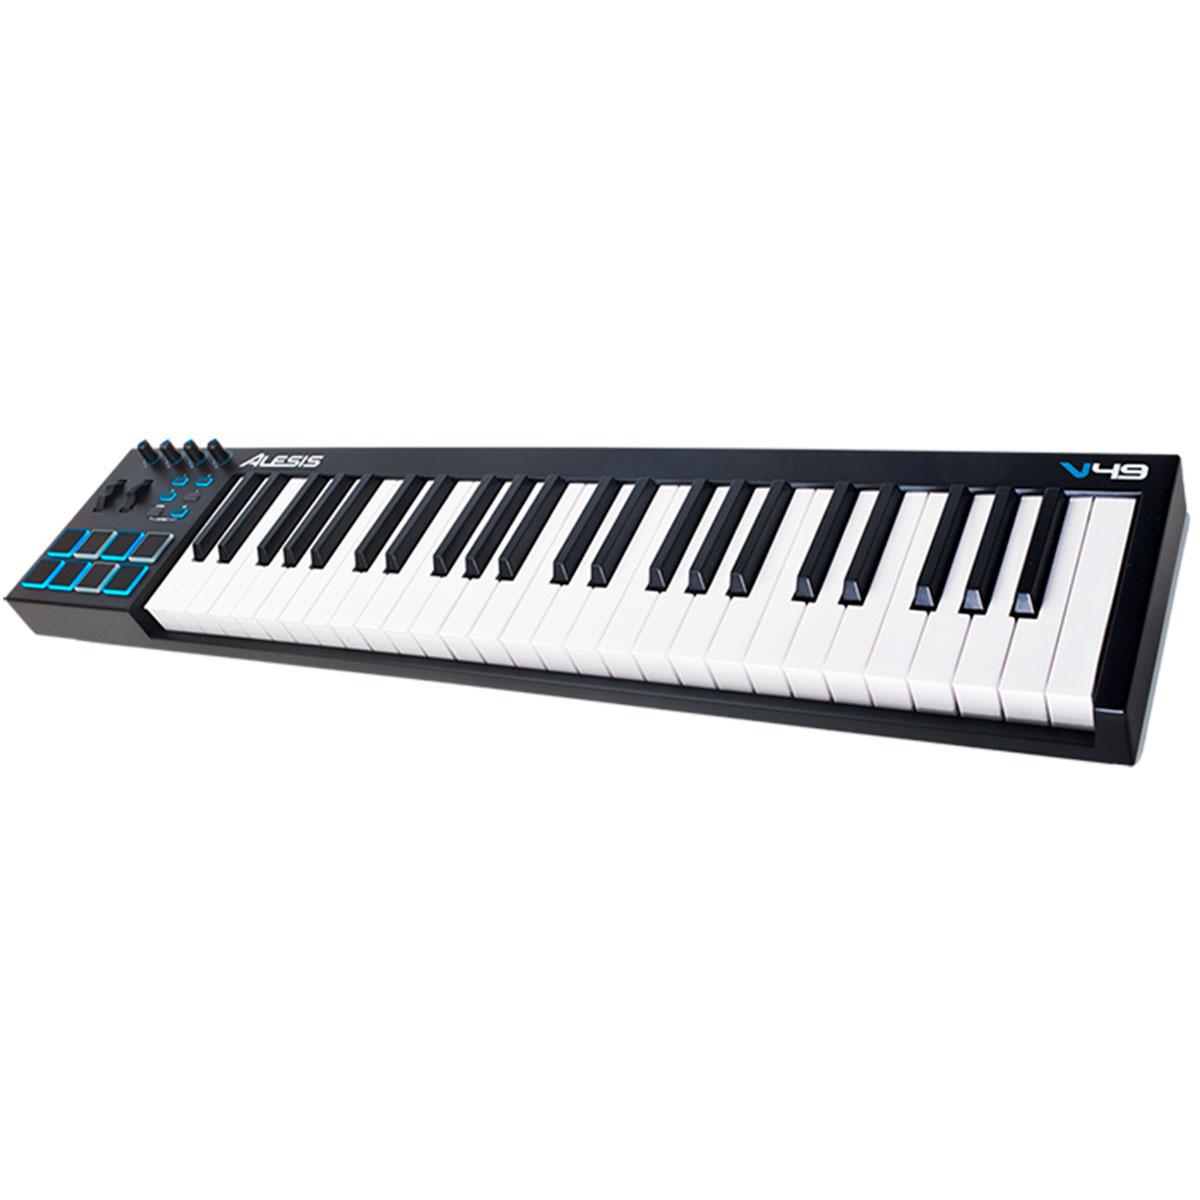 V49 - Teclado Controlador MIDI / USB V 49 - Alesis